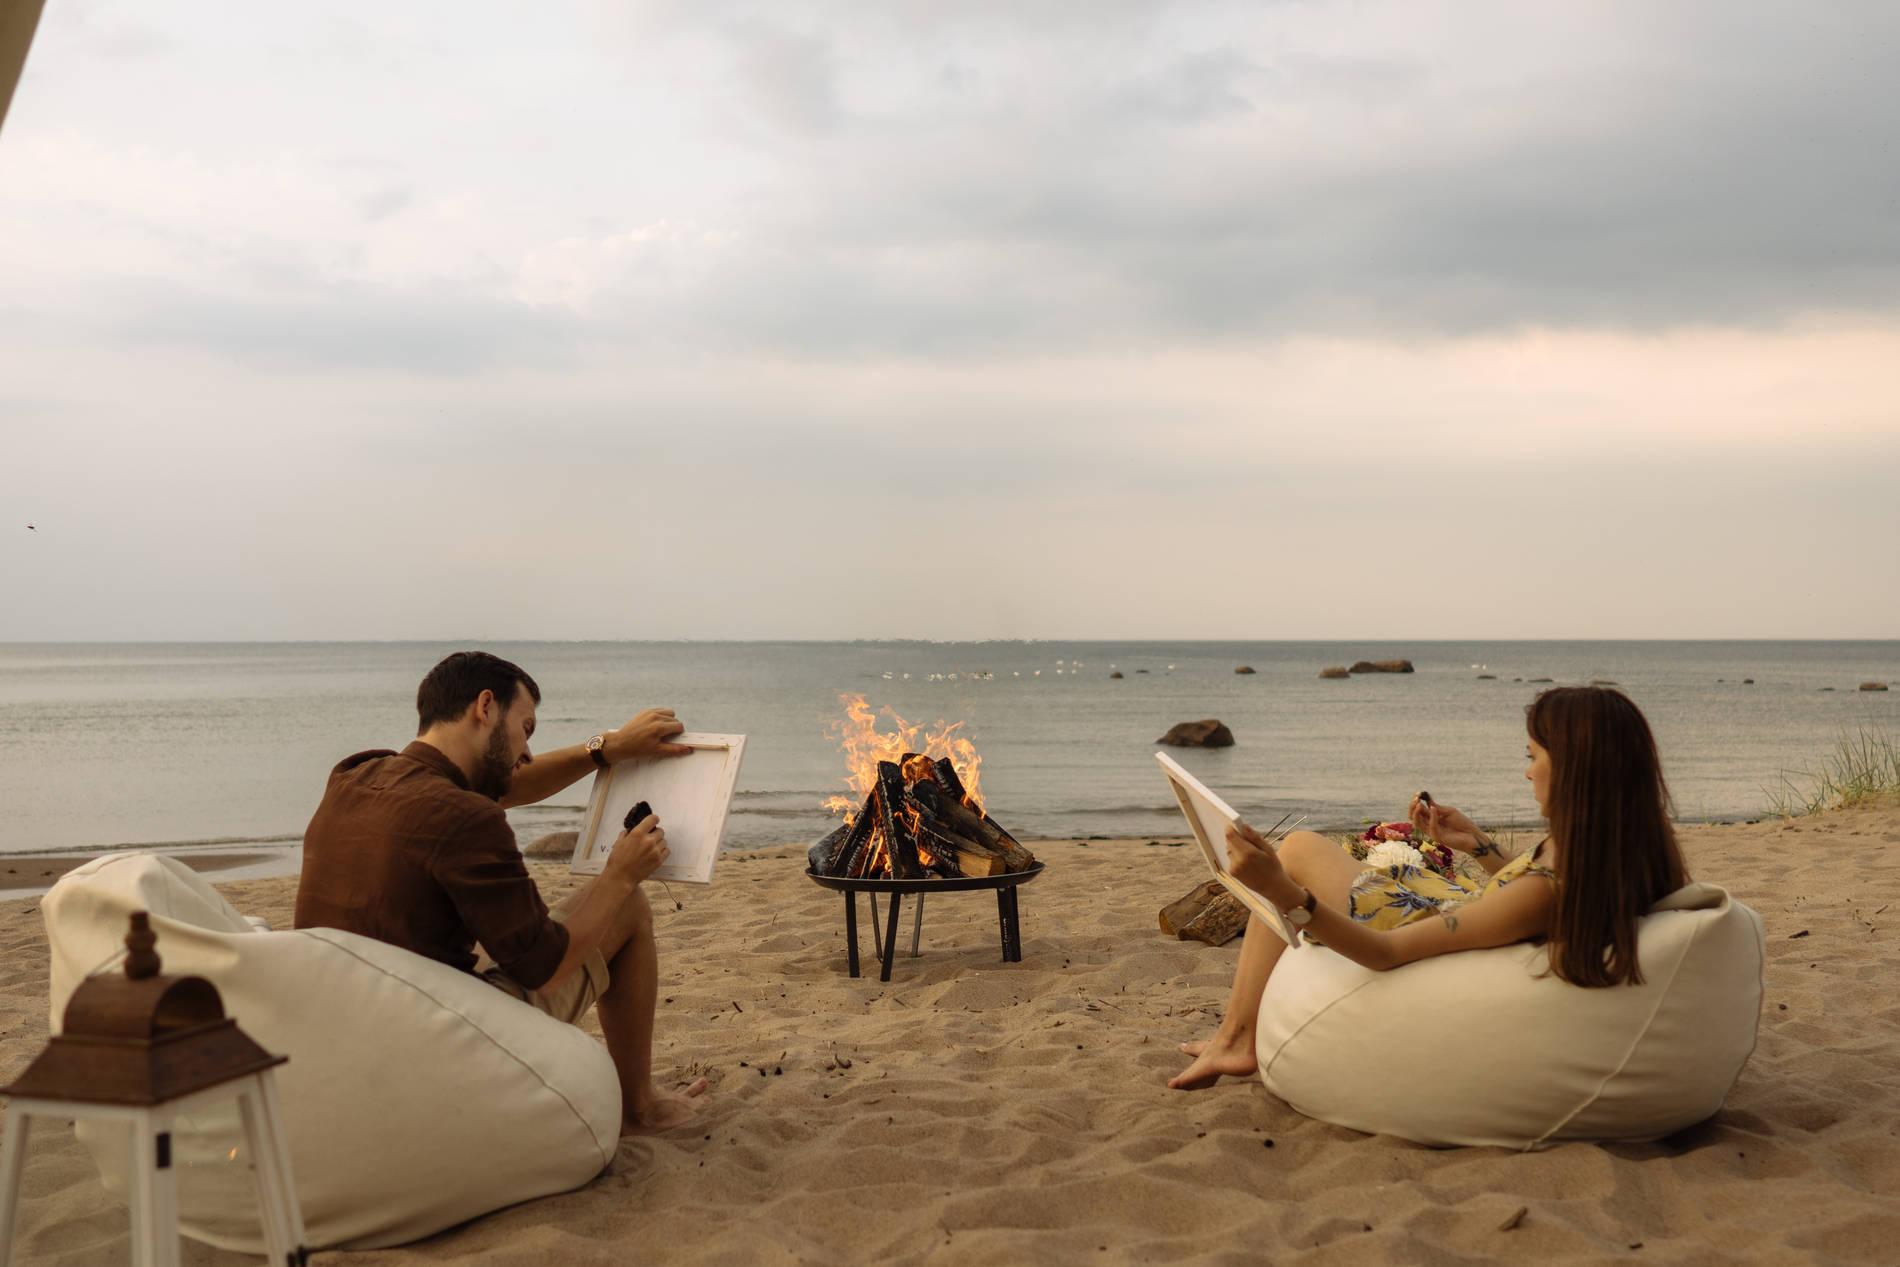 A couple on a beach in Tallinn, Estonia